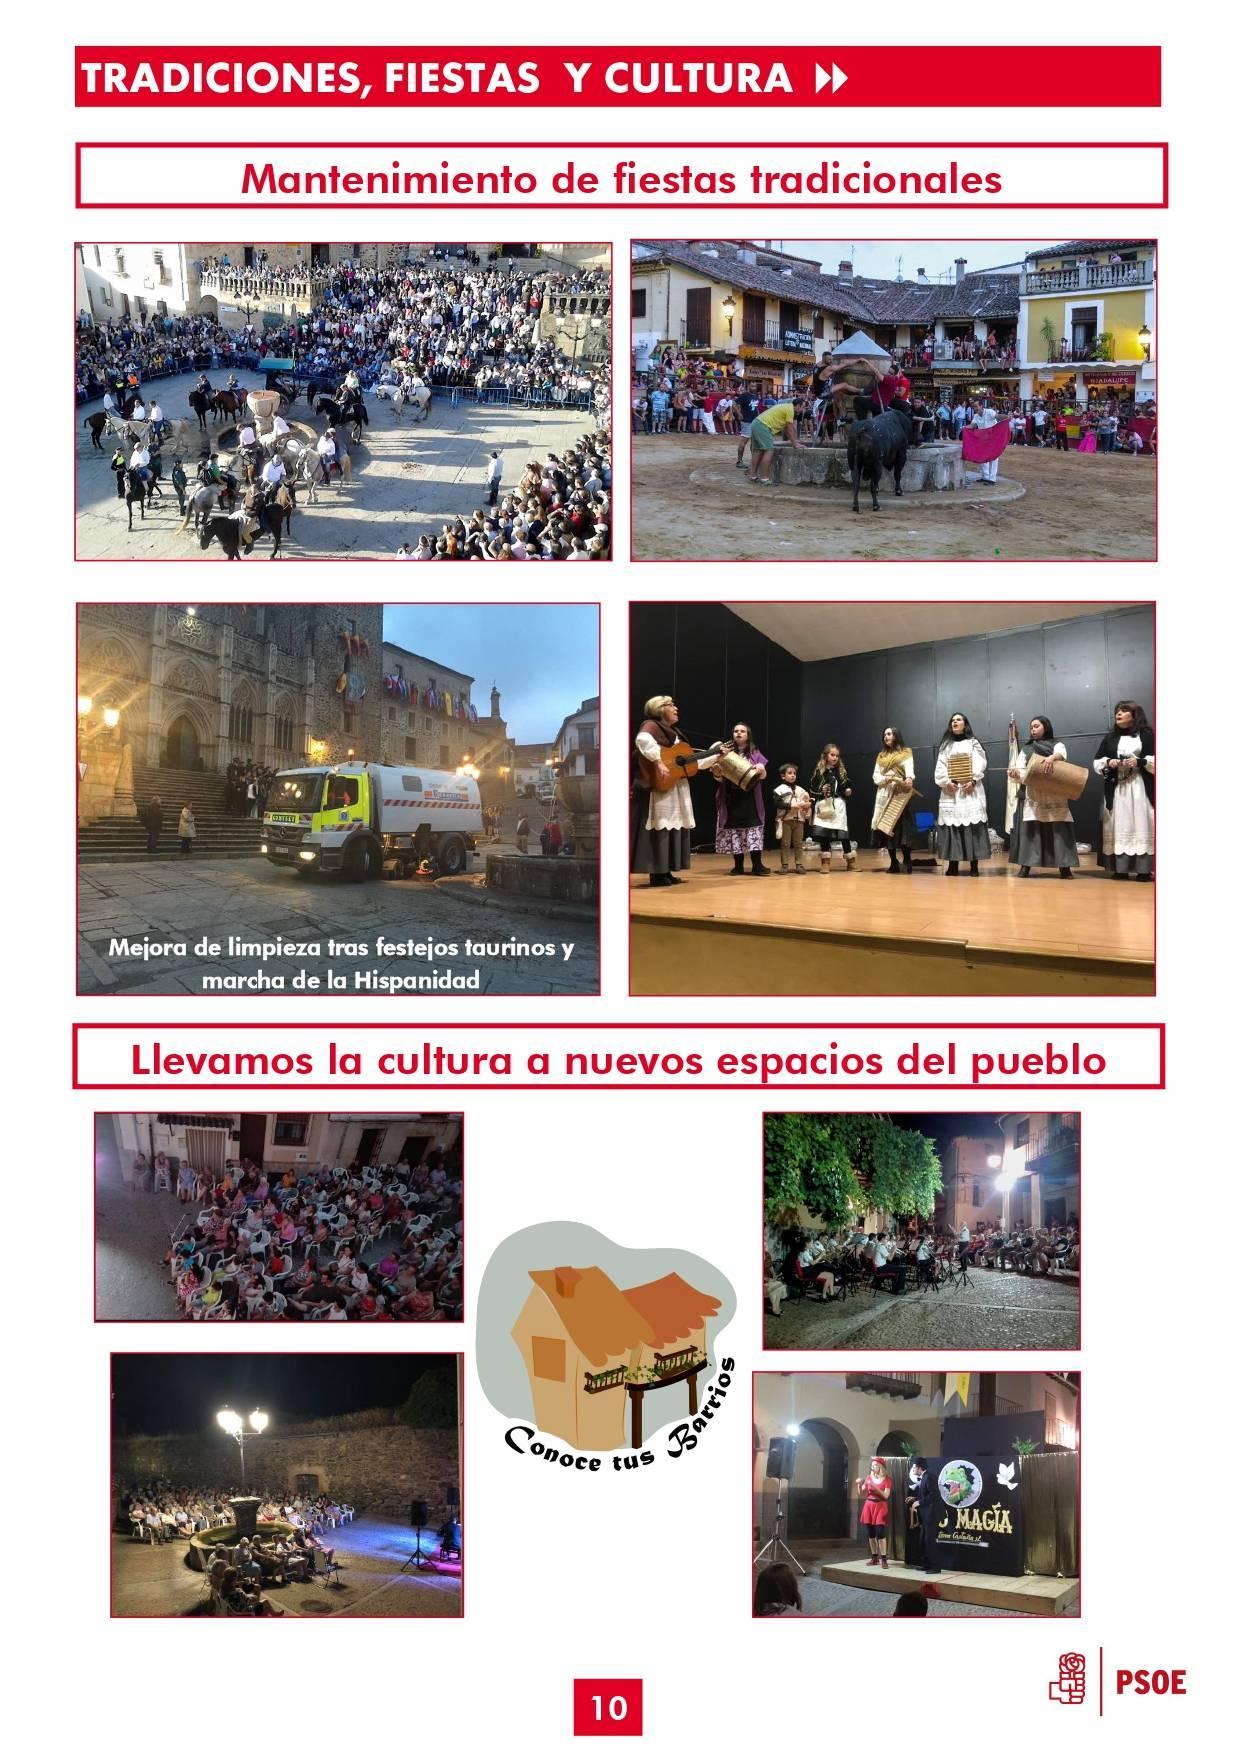 Boletín informativo de gestión municipal 2015-2019 - Guadalupe (Cáceres) 10